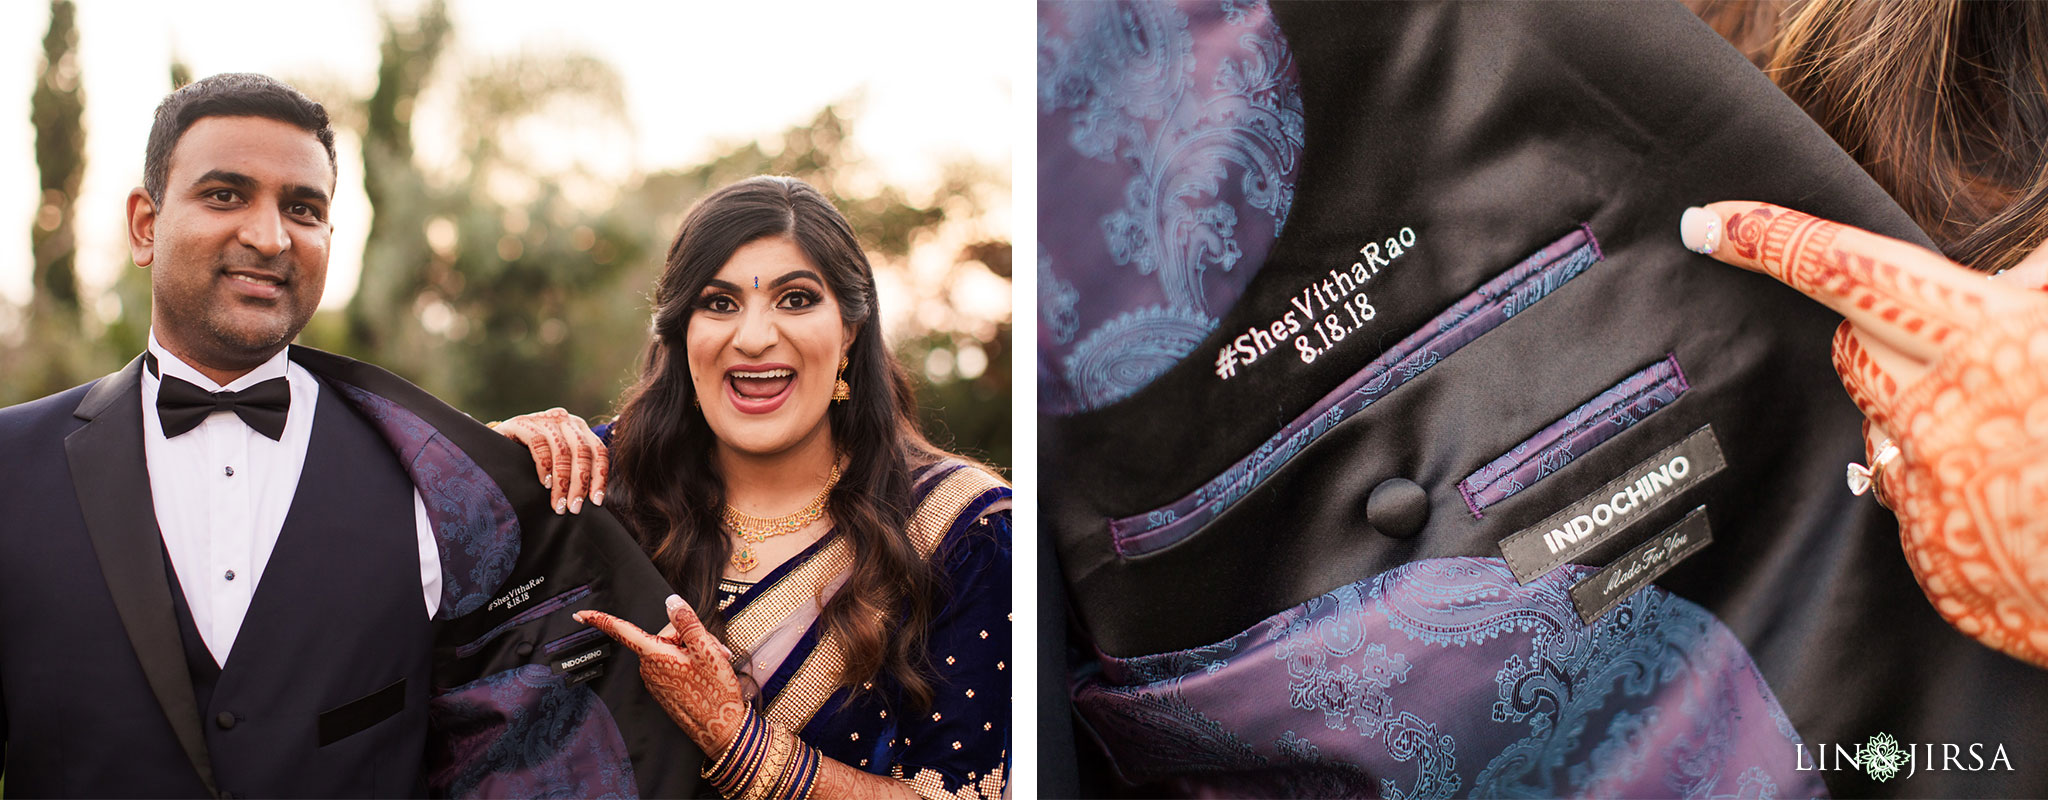 35 sheraton carlsbad resort indian wedding photography